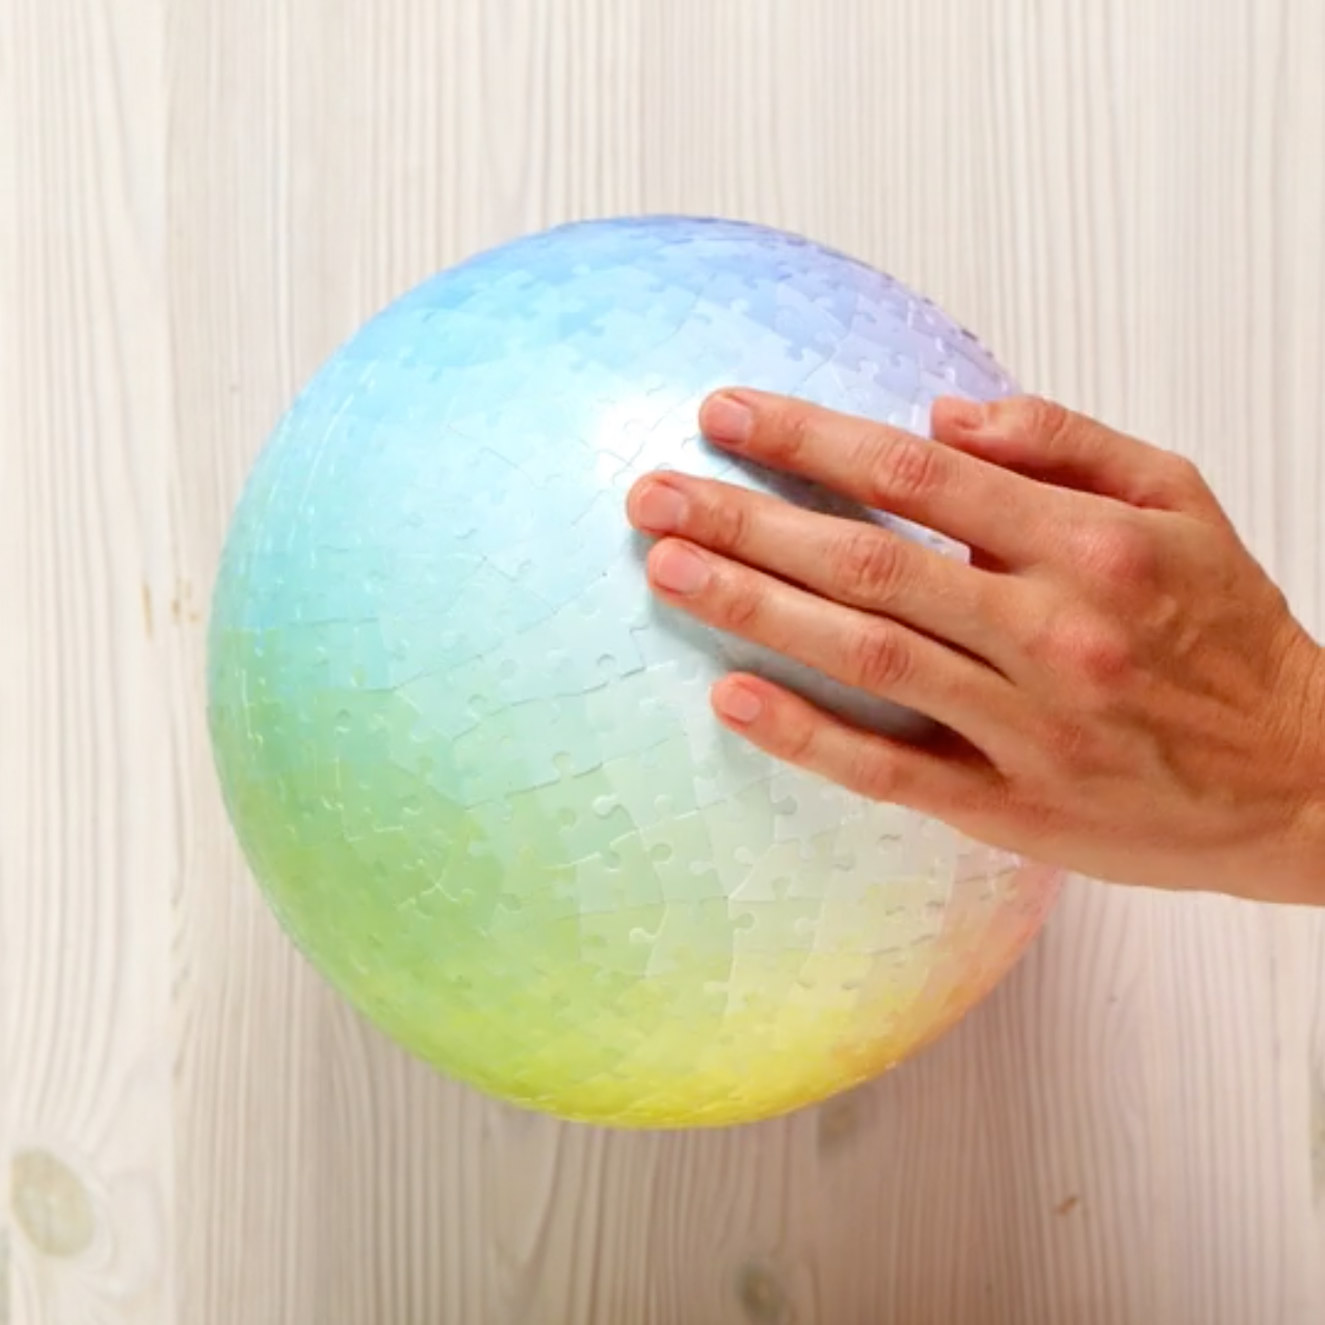 Sphere Shaped Gradient Puzzle Contains 540 Different Colors